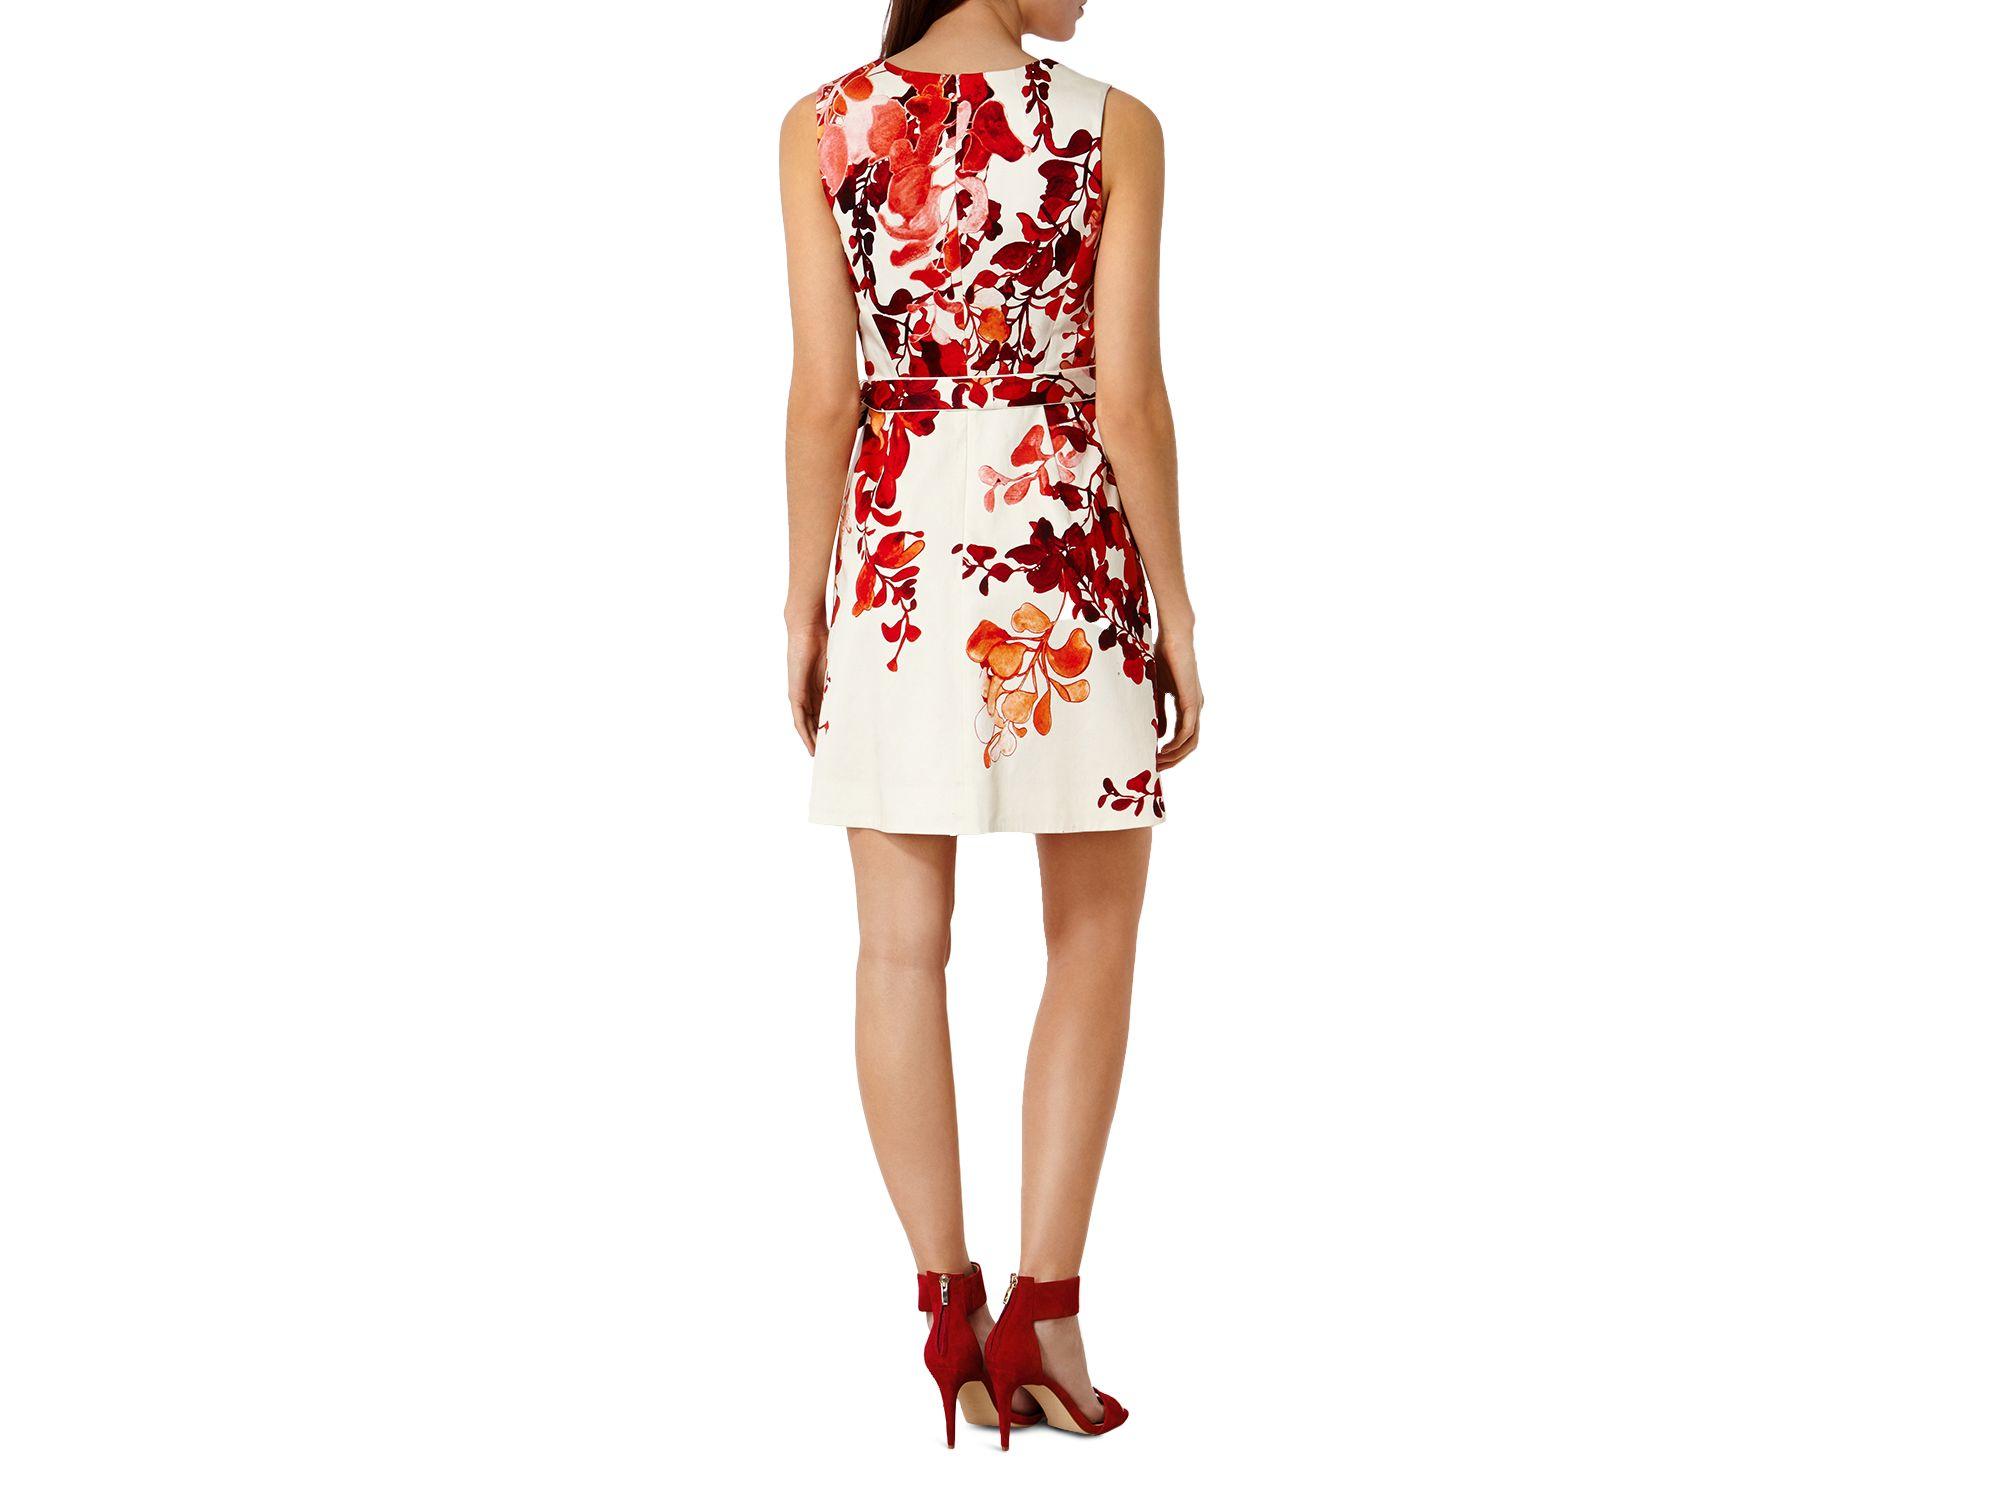 cd02f60edf Lyst - Karen Millen Spice Wisteria Print Dress